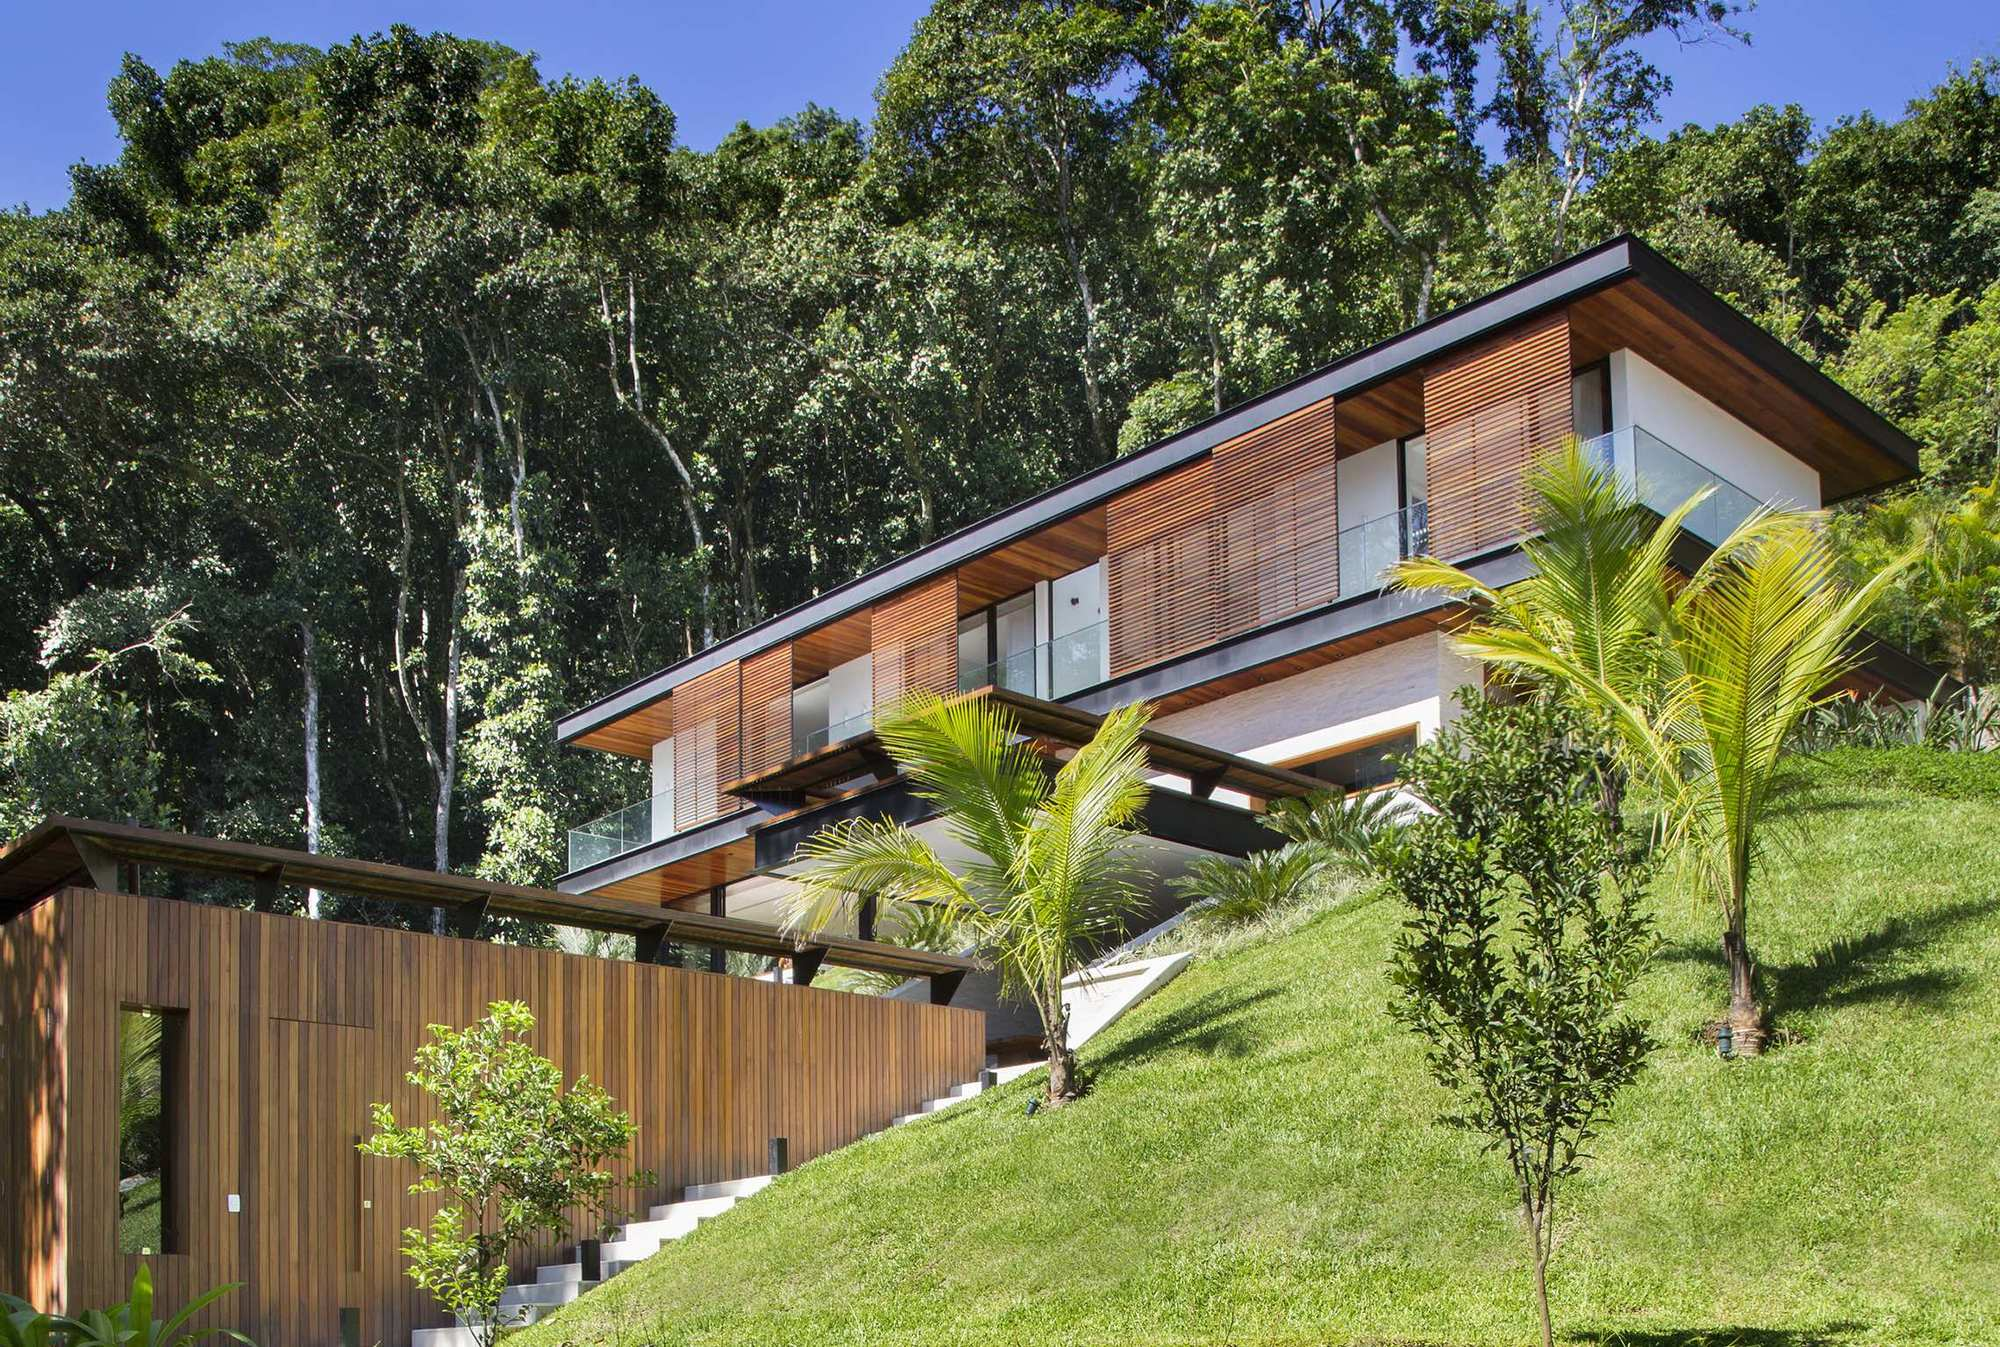 Portobello house tripper arquitetura archdaily